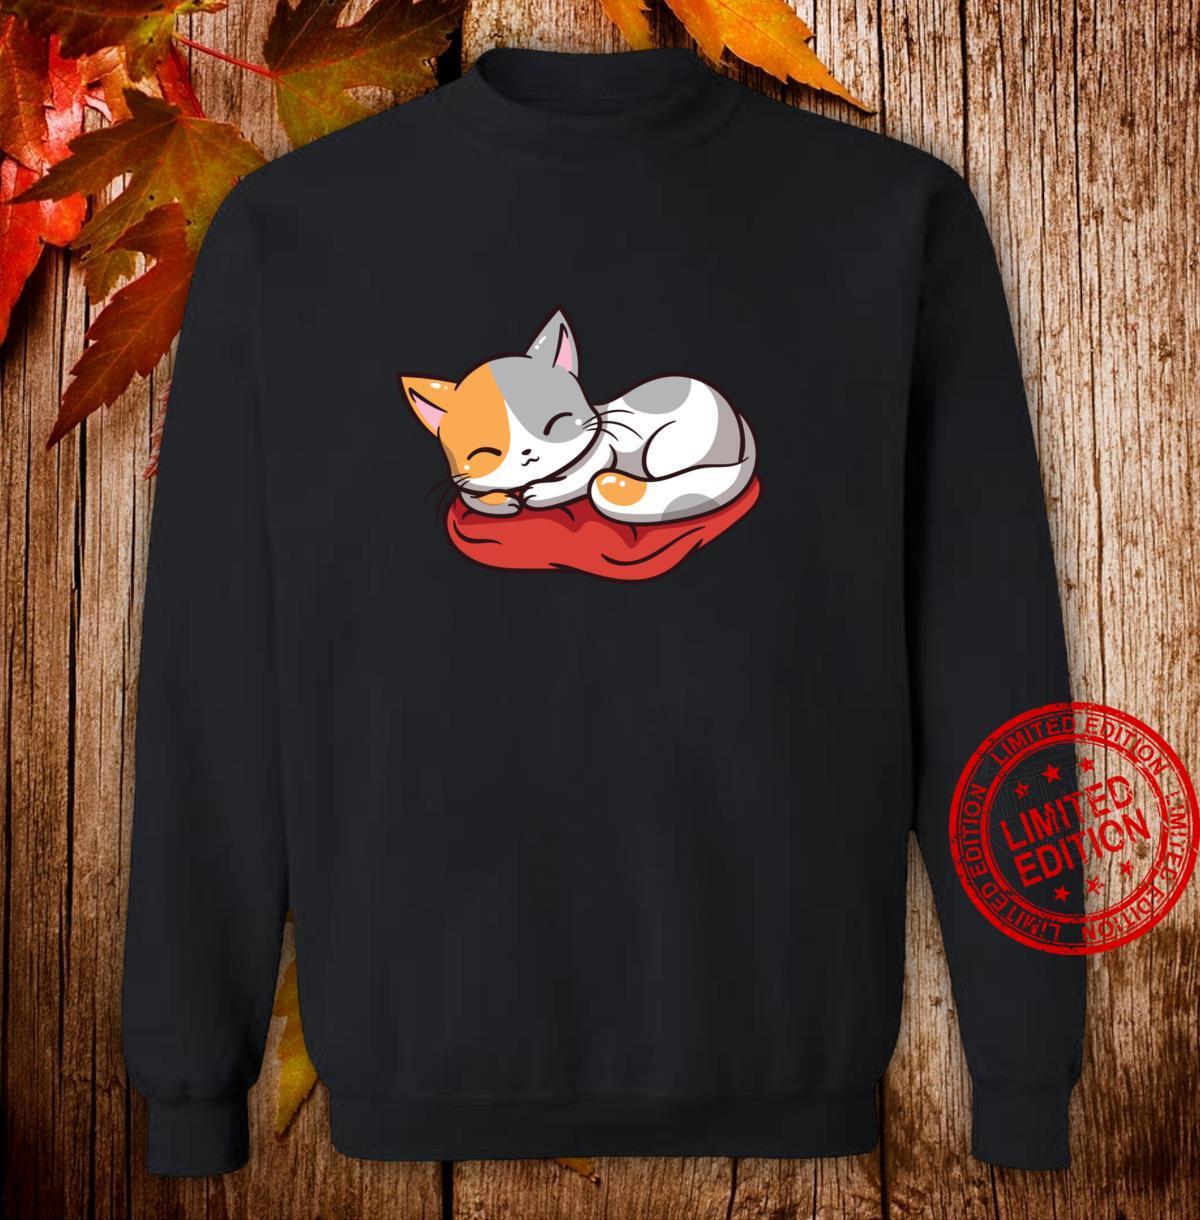 Kawaii süße japanische Anime Katze Neko Girl Langarmshirt Shirt sweater